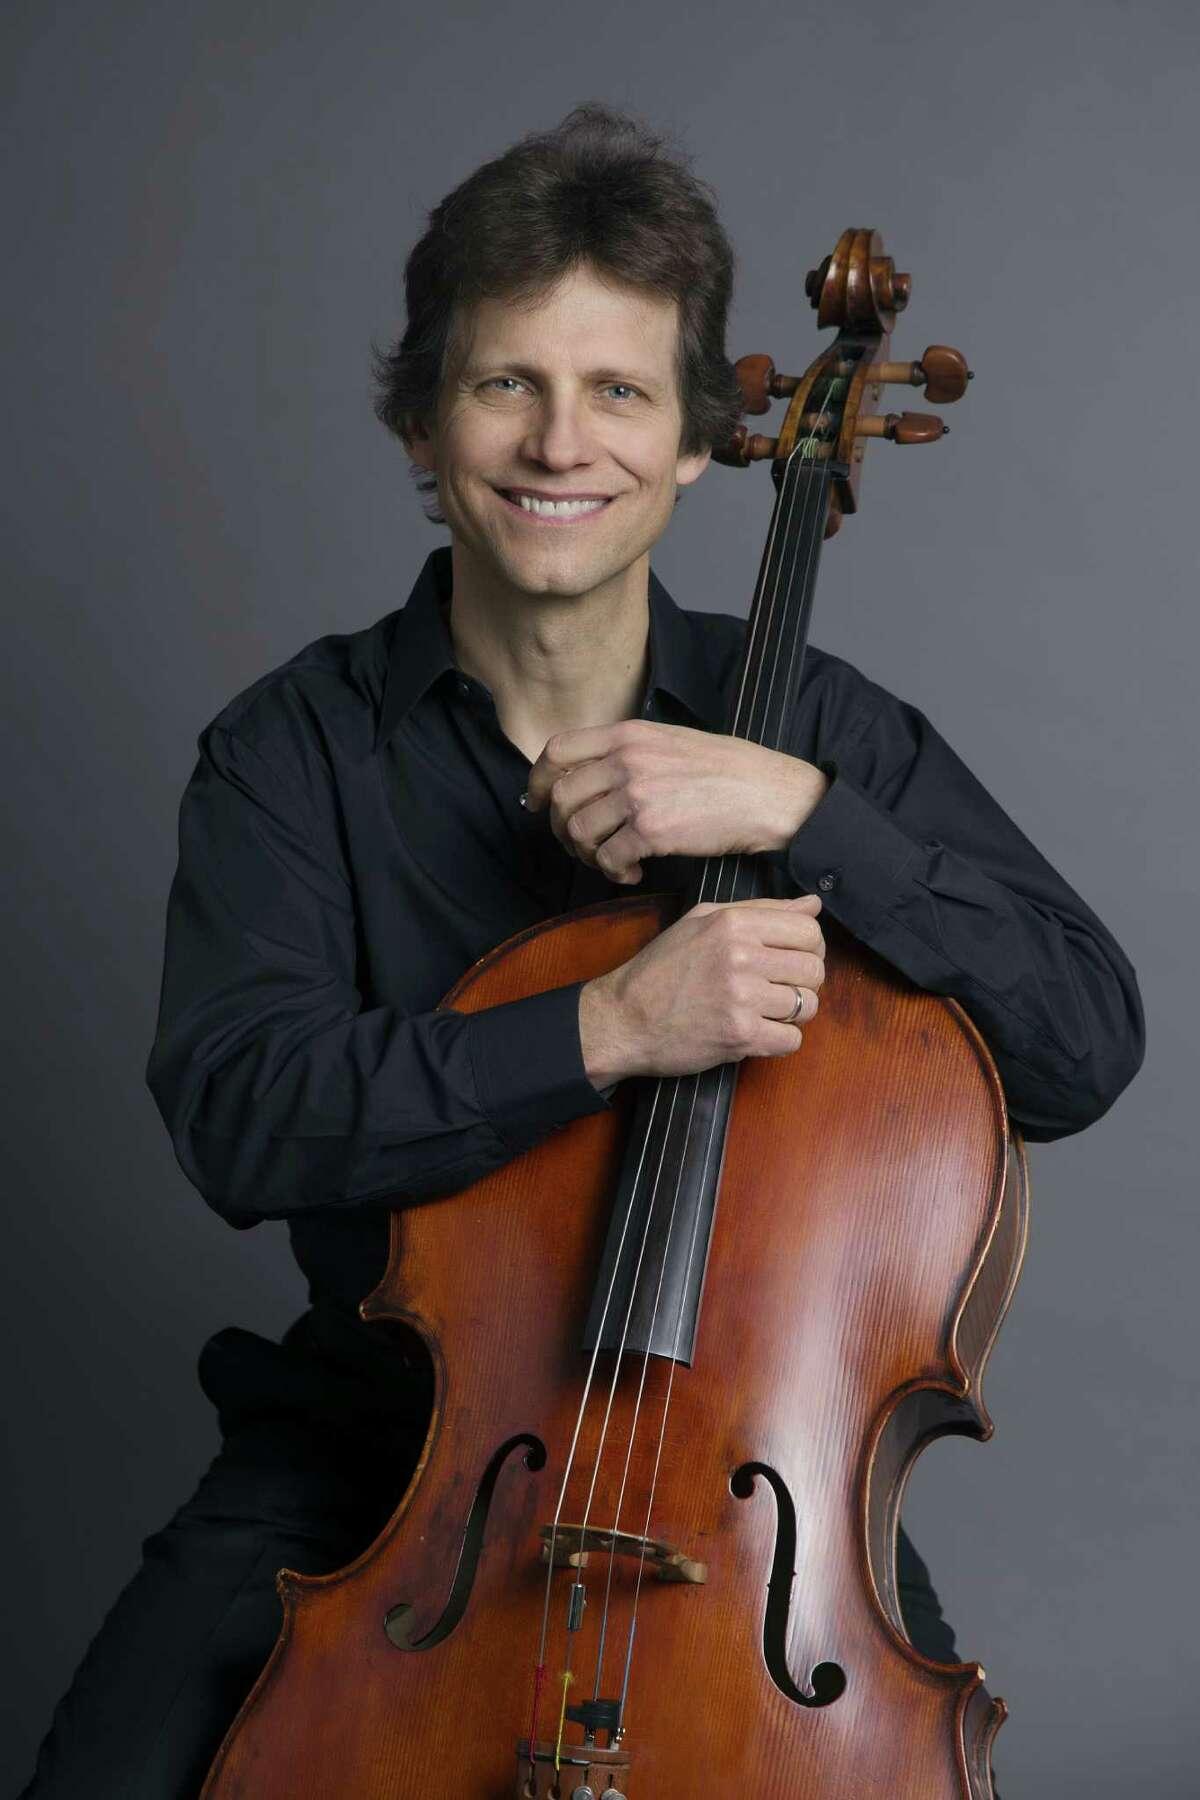 Philadelphia Orchestra cellist Bob Cafaro (photo courtesy Bob Cafaro)